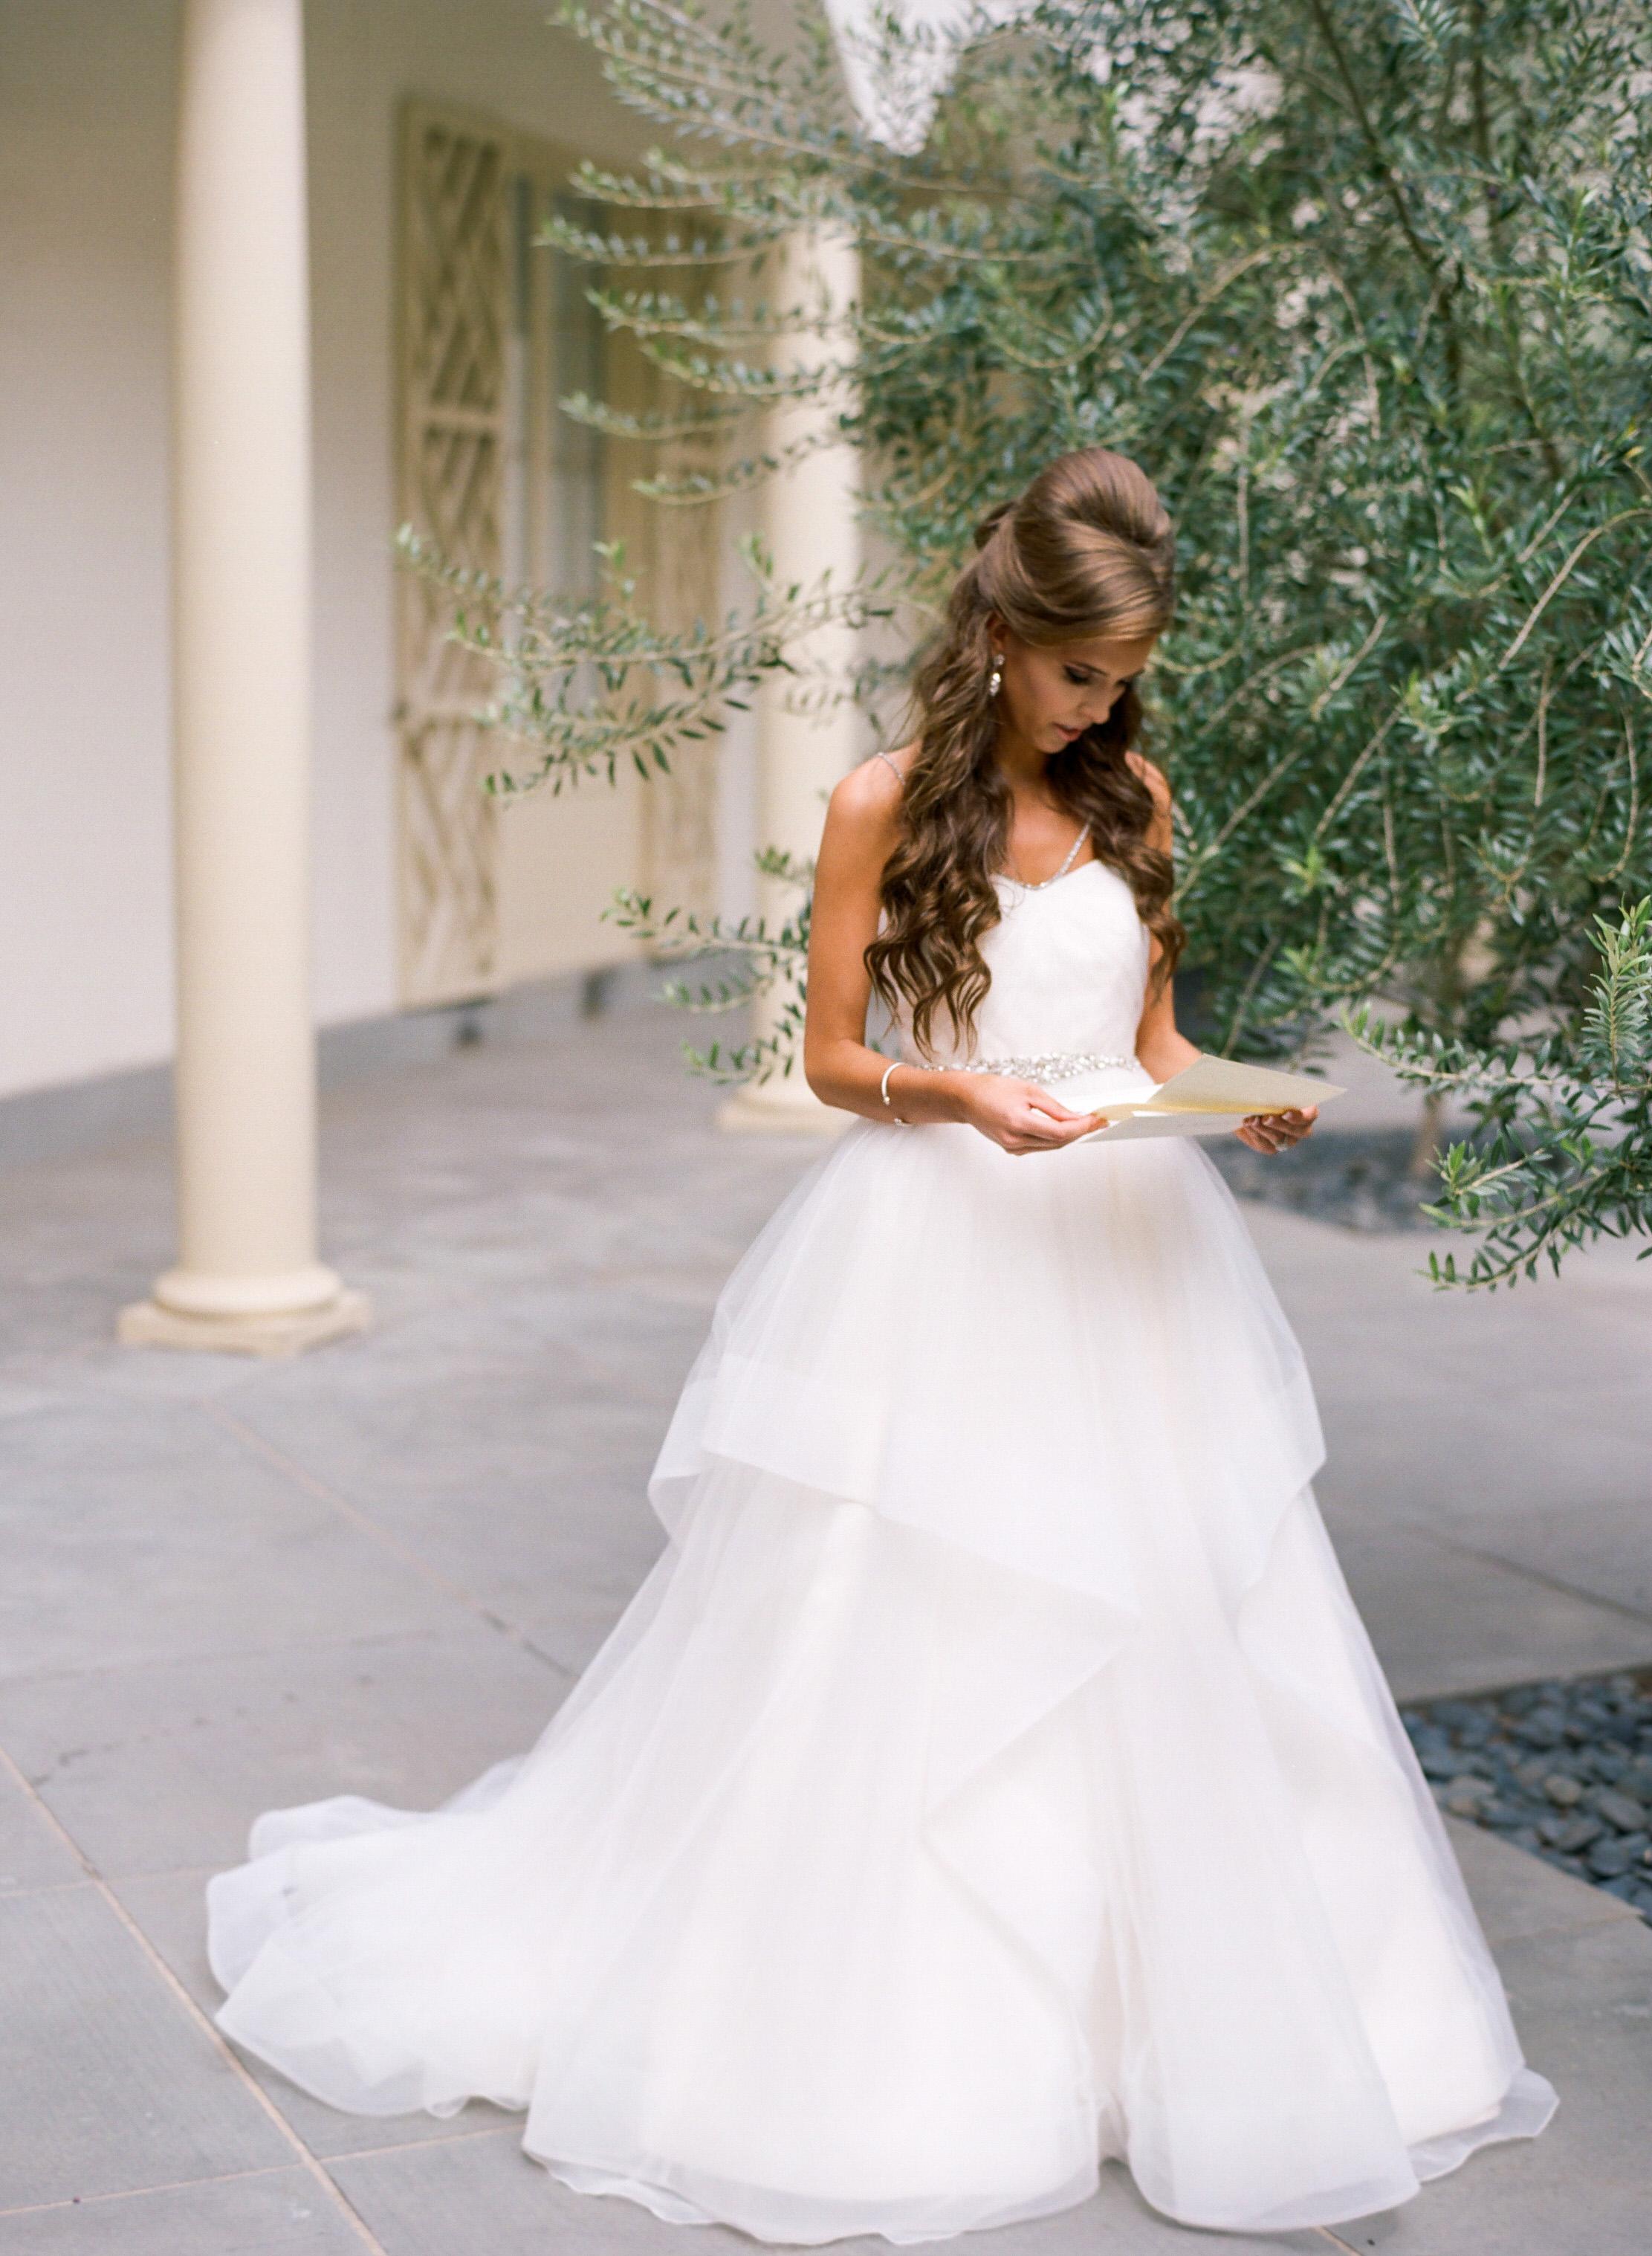 Dana-Fernandez-Photography-Weddings-in-Houston-Magazine-feature-Houston-wedding-photographer-film-11.jpg